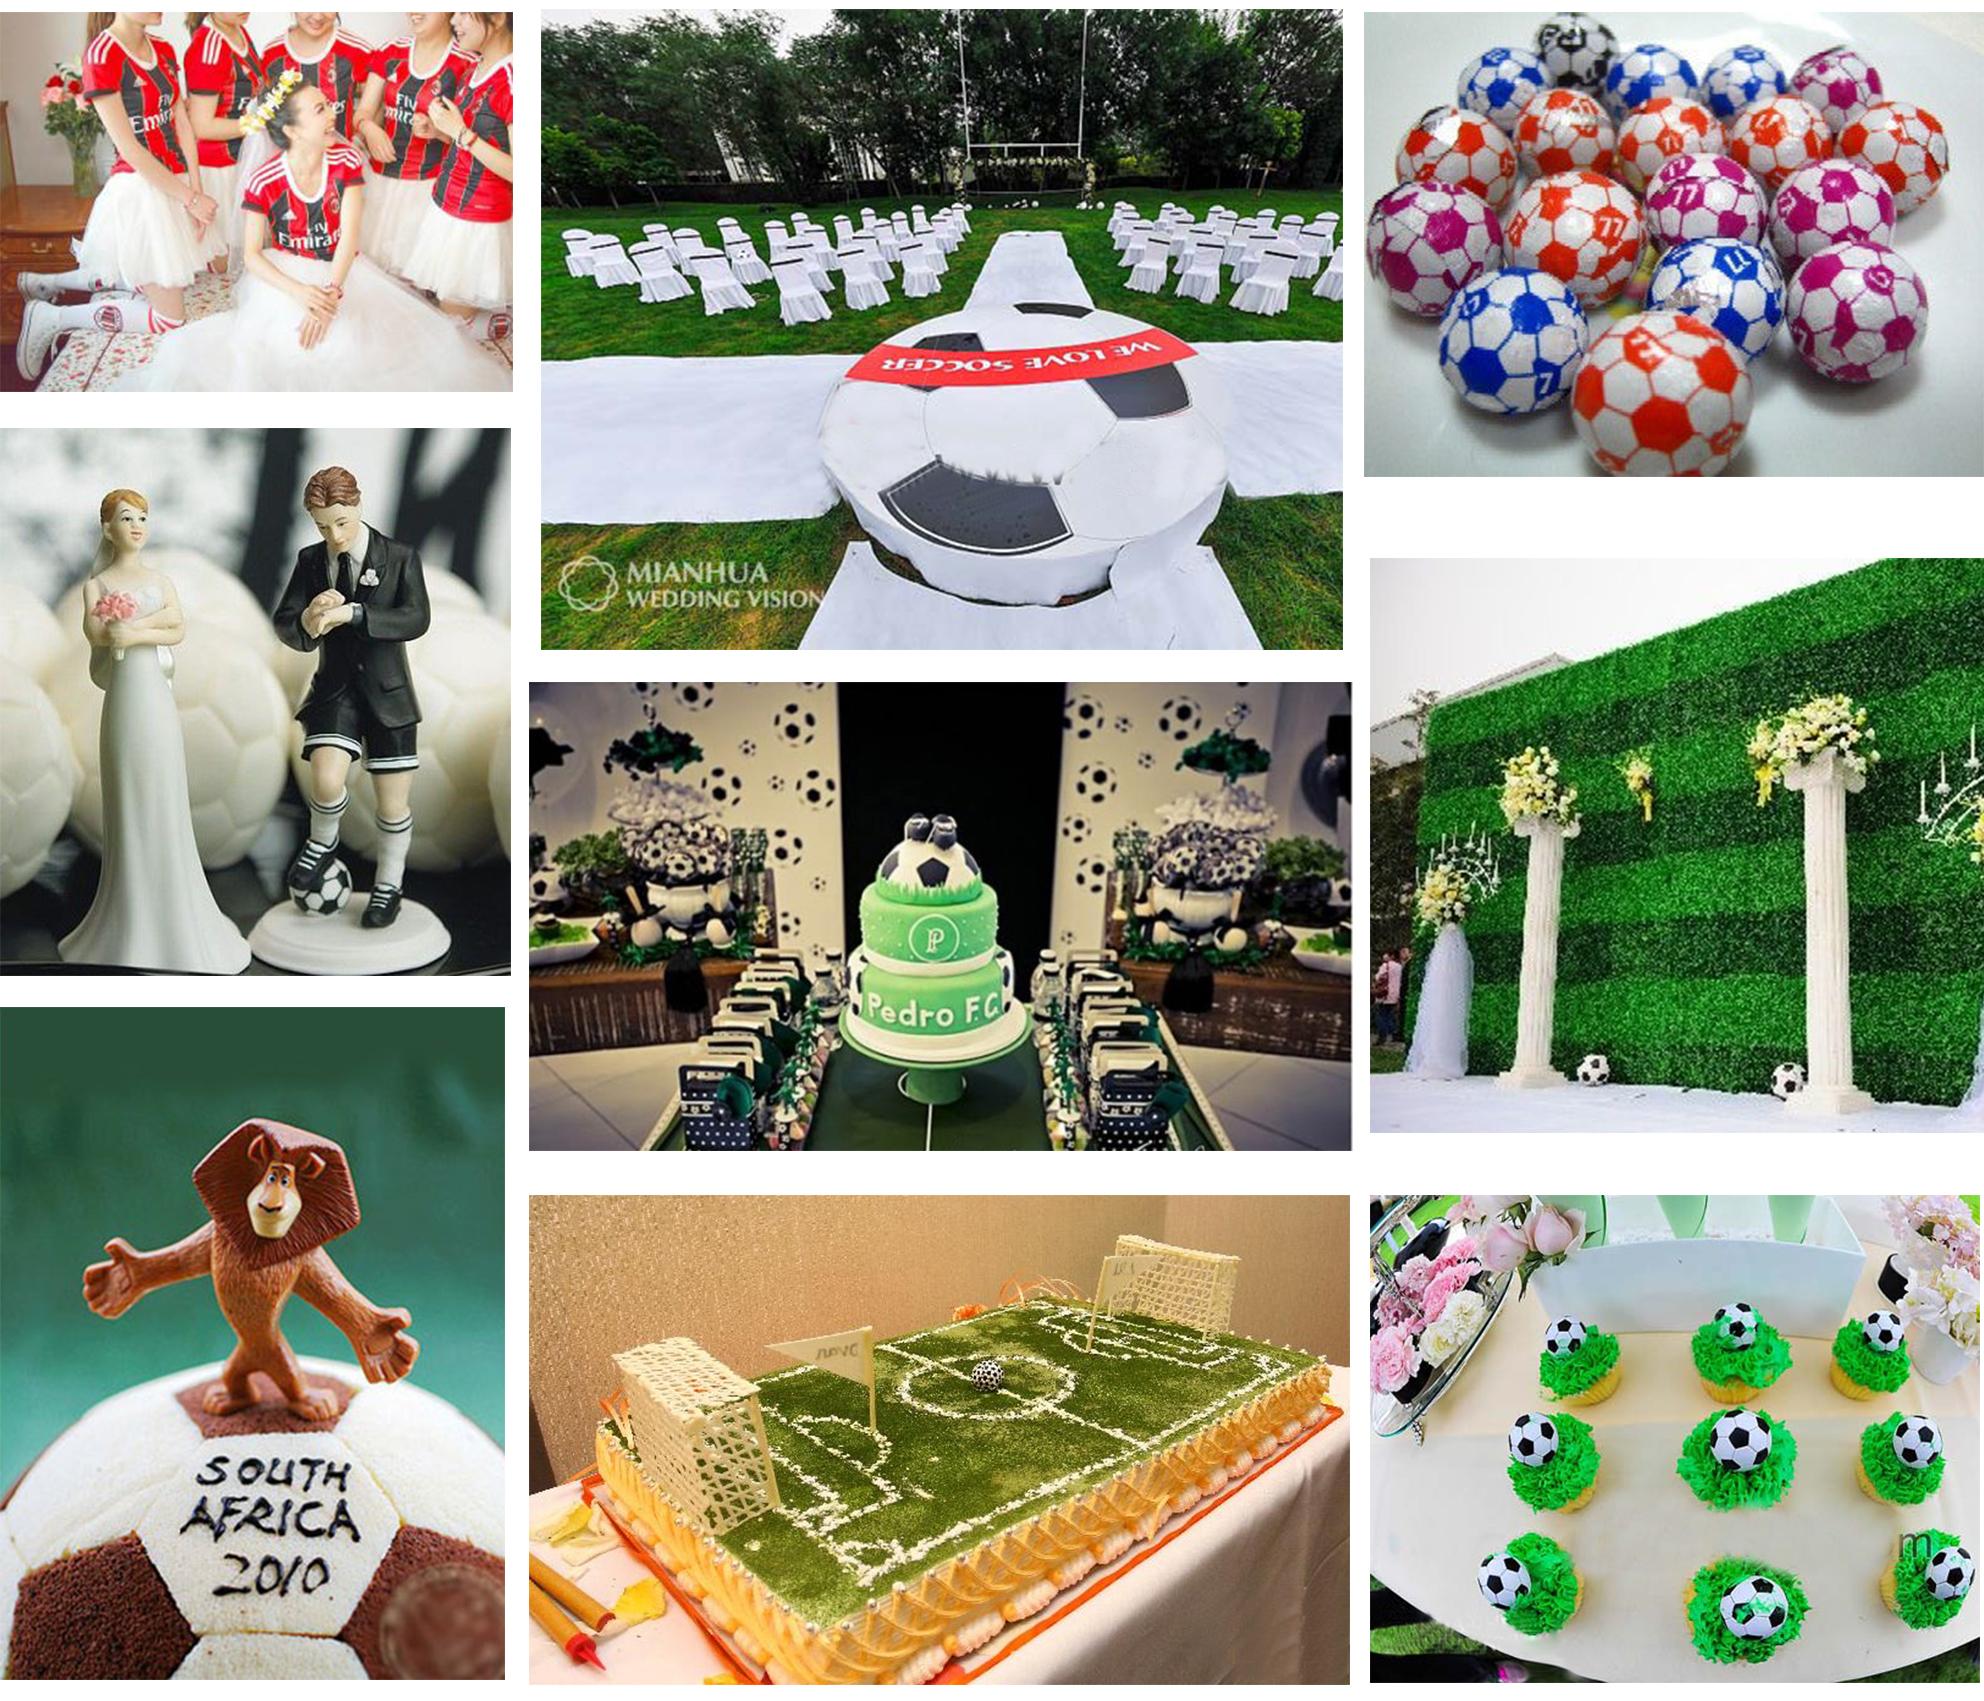 Soccer Themed Wedding Ideas: Football Themed Wedding Party